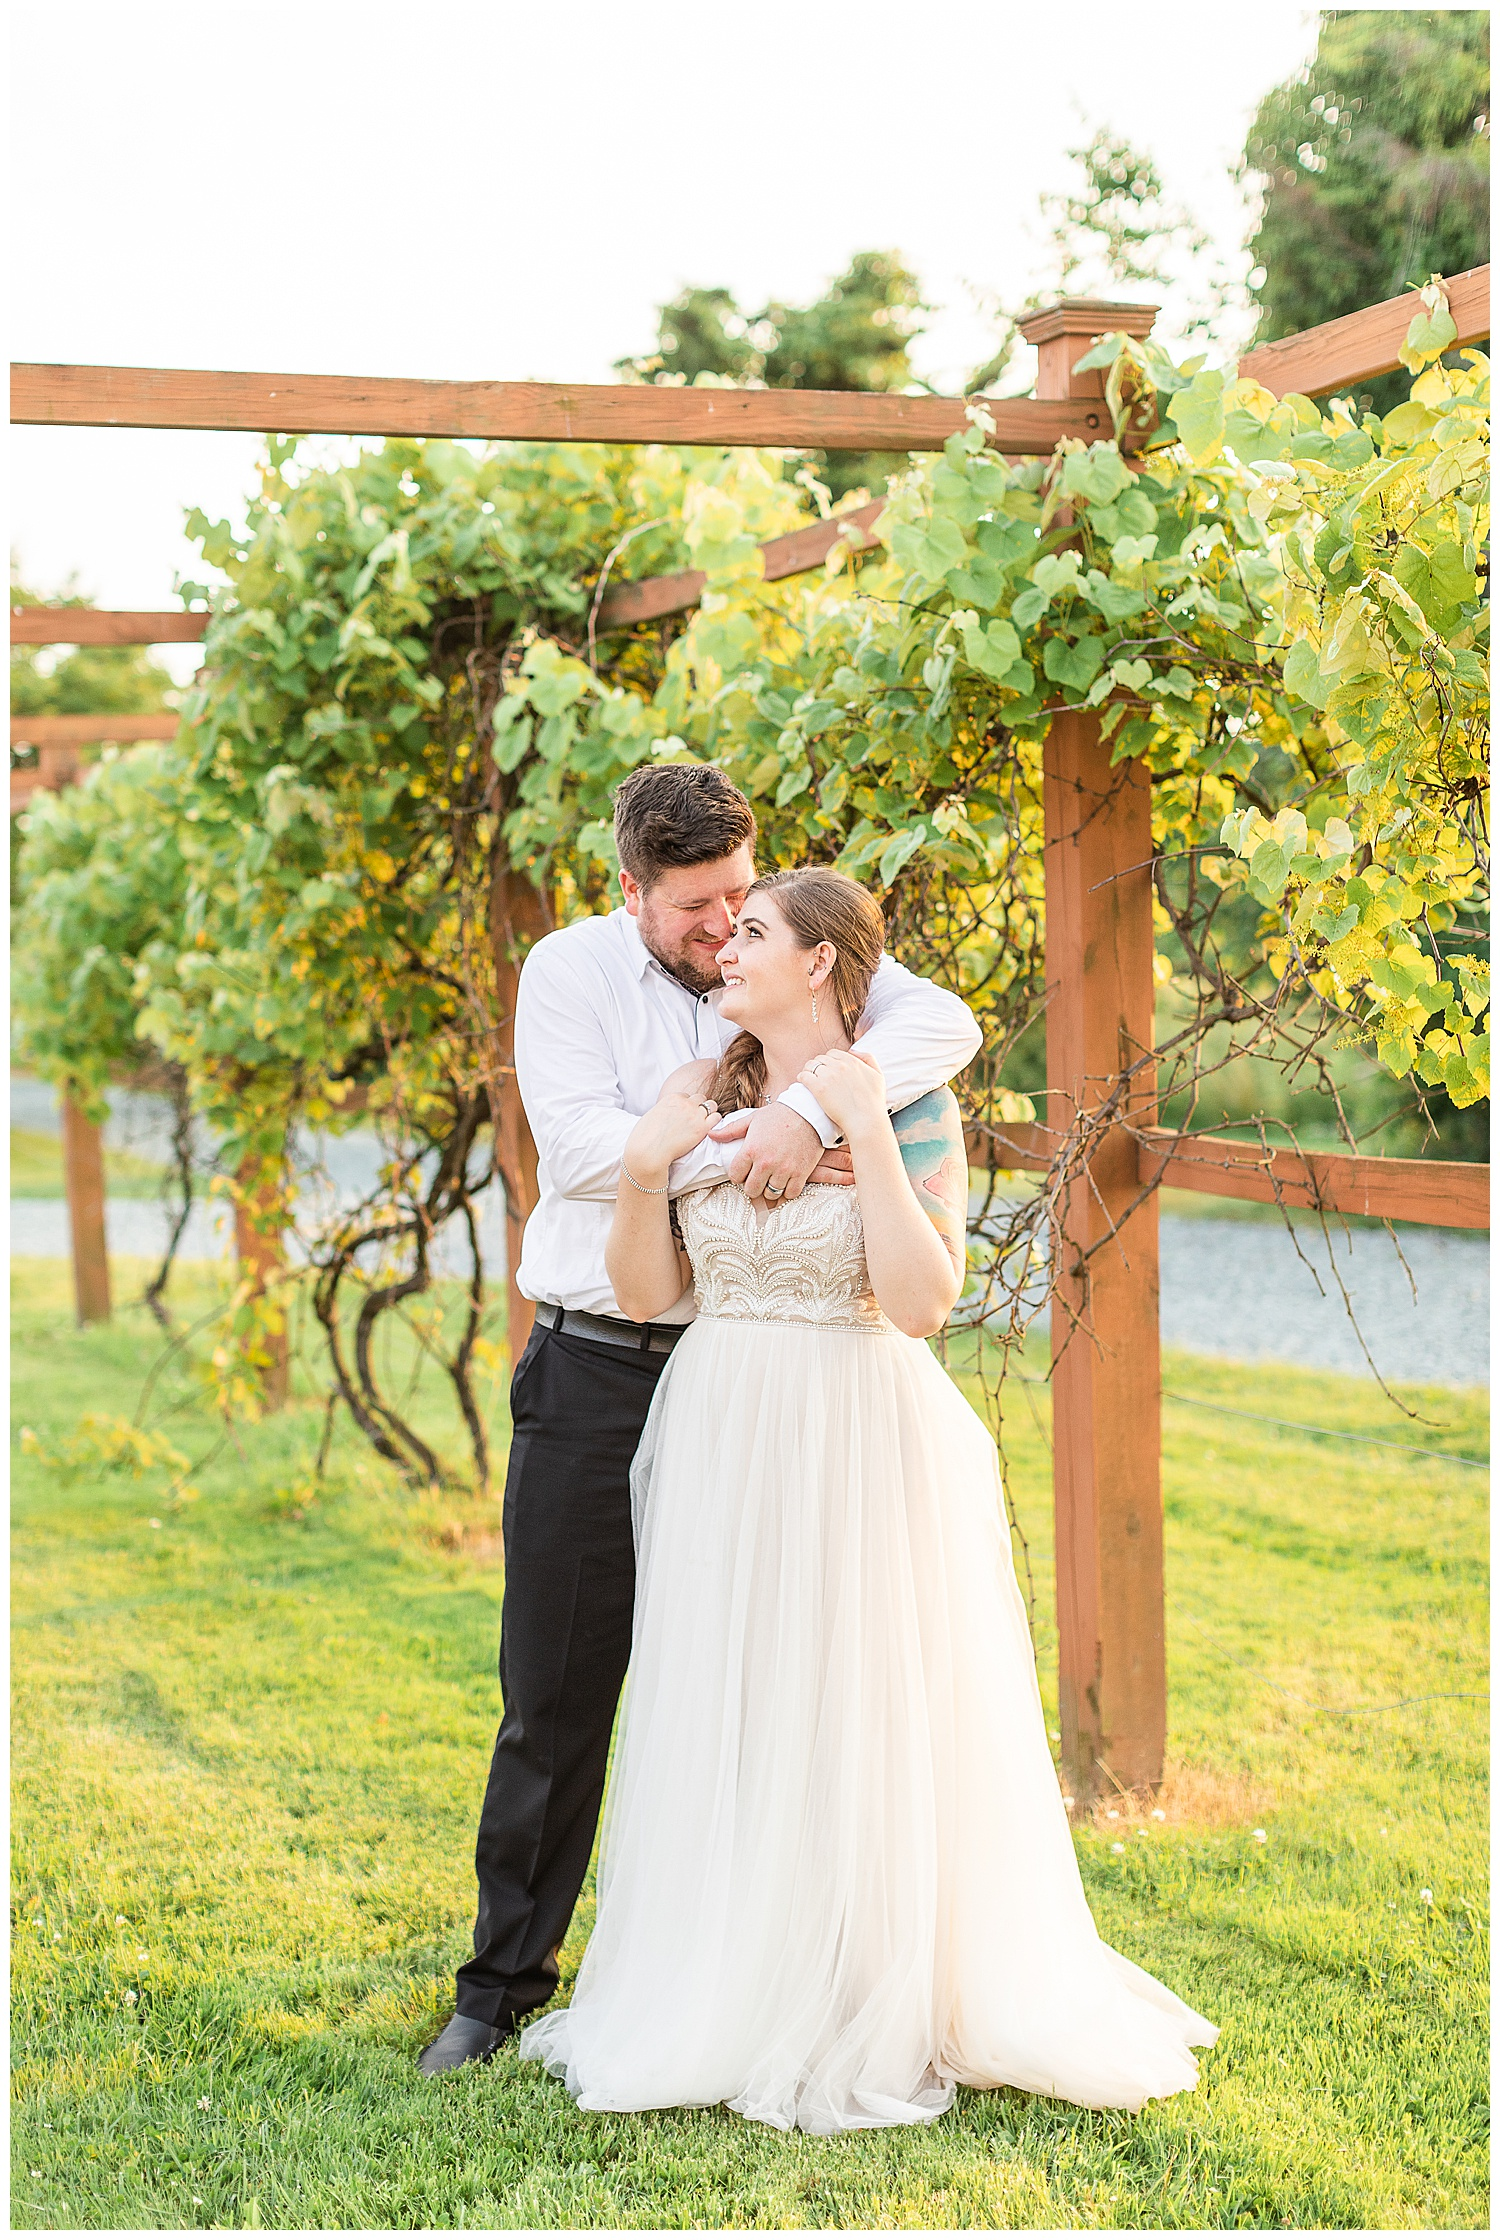 Bohemia-Overlook-Wedding-photos_0117.jpg